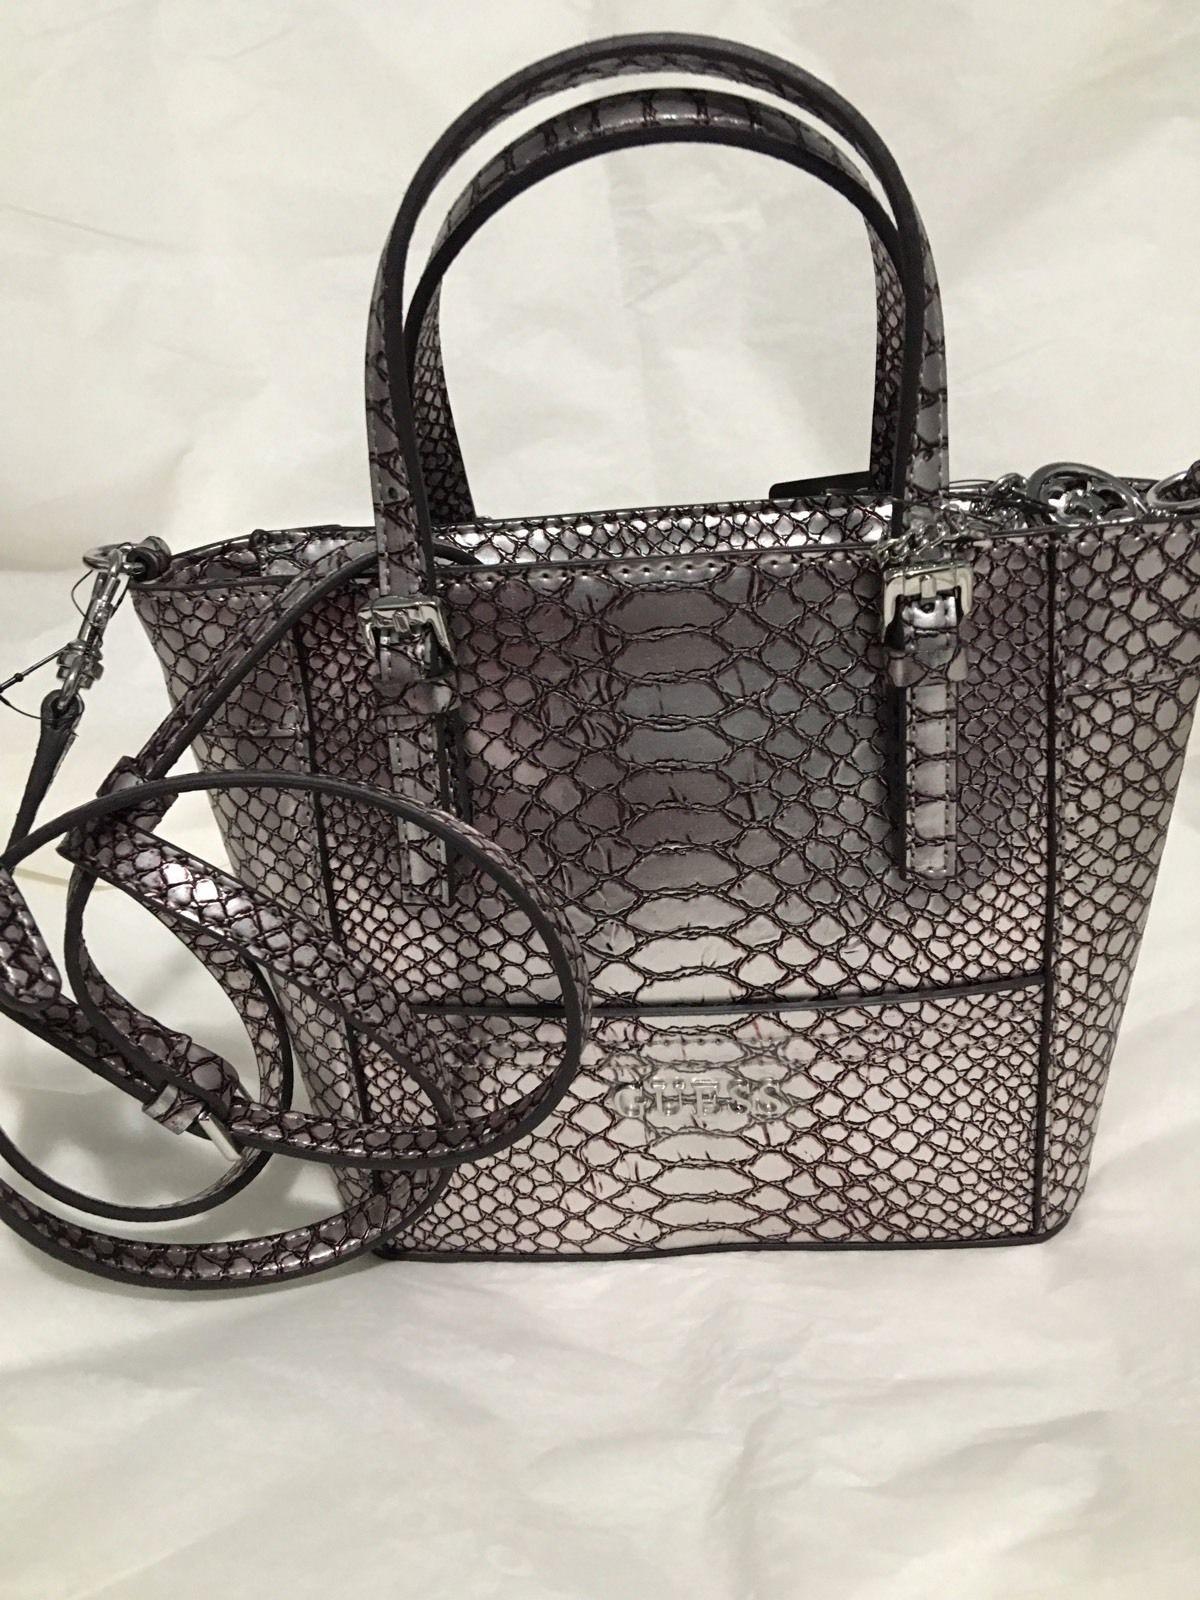 ffd914f132f9 Delaney 4G Logo Petite Tote Handbag With Crossbody Strap 4 Colors Bag NWT  XLV  39.99